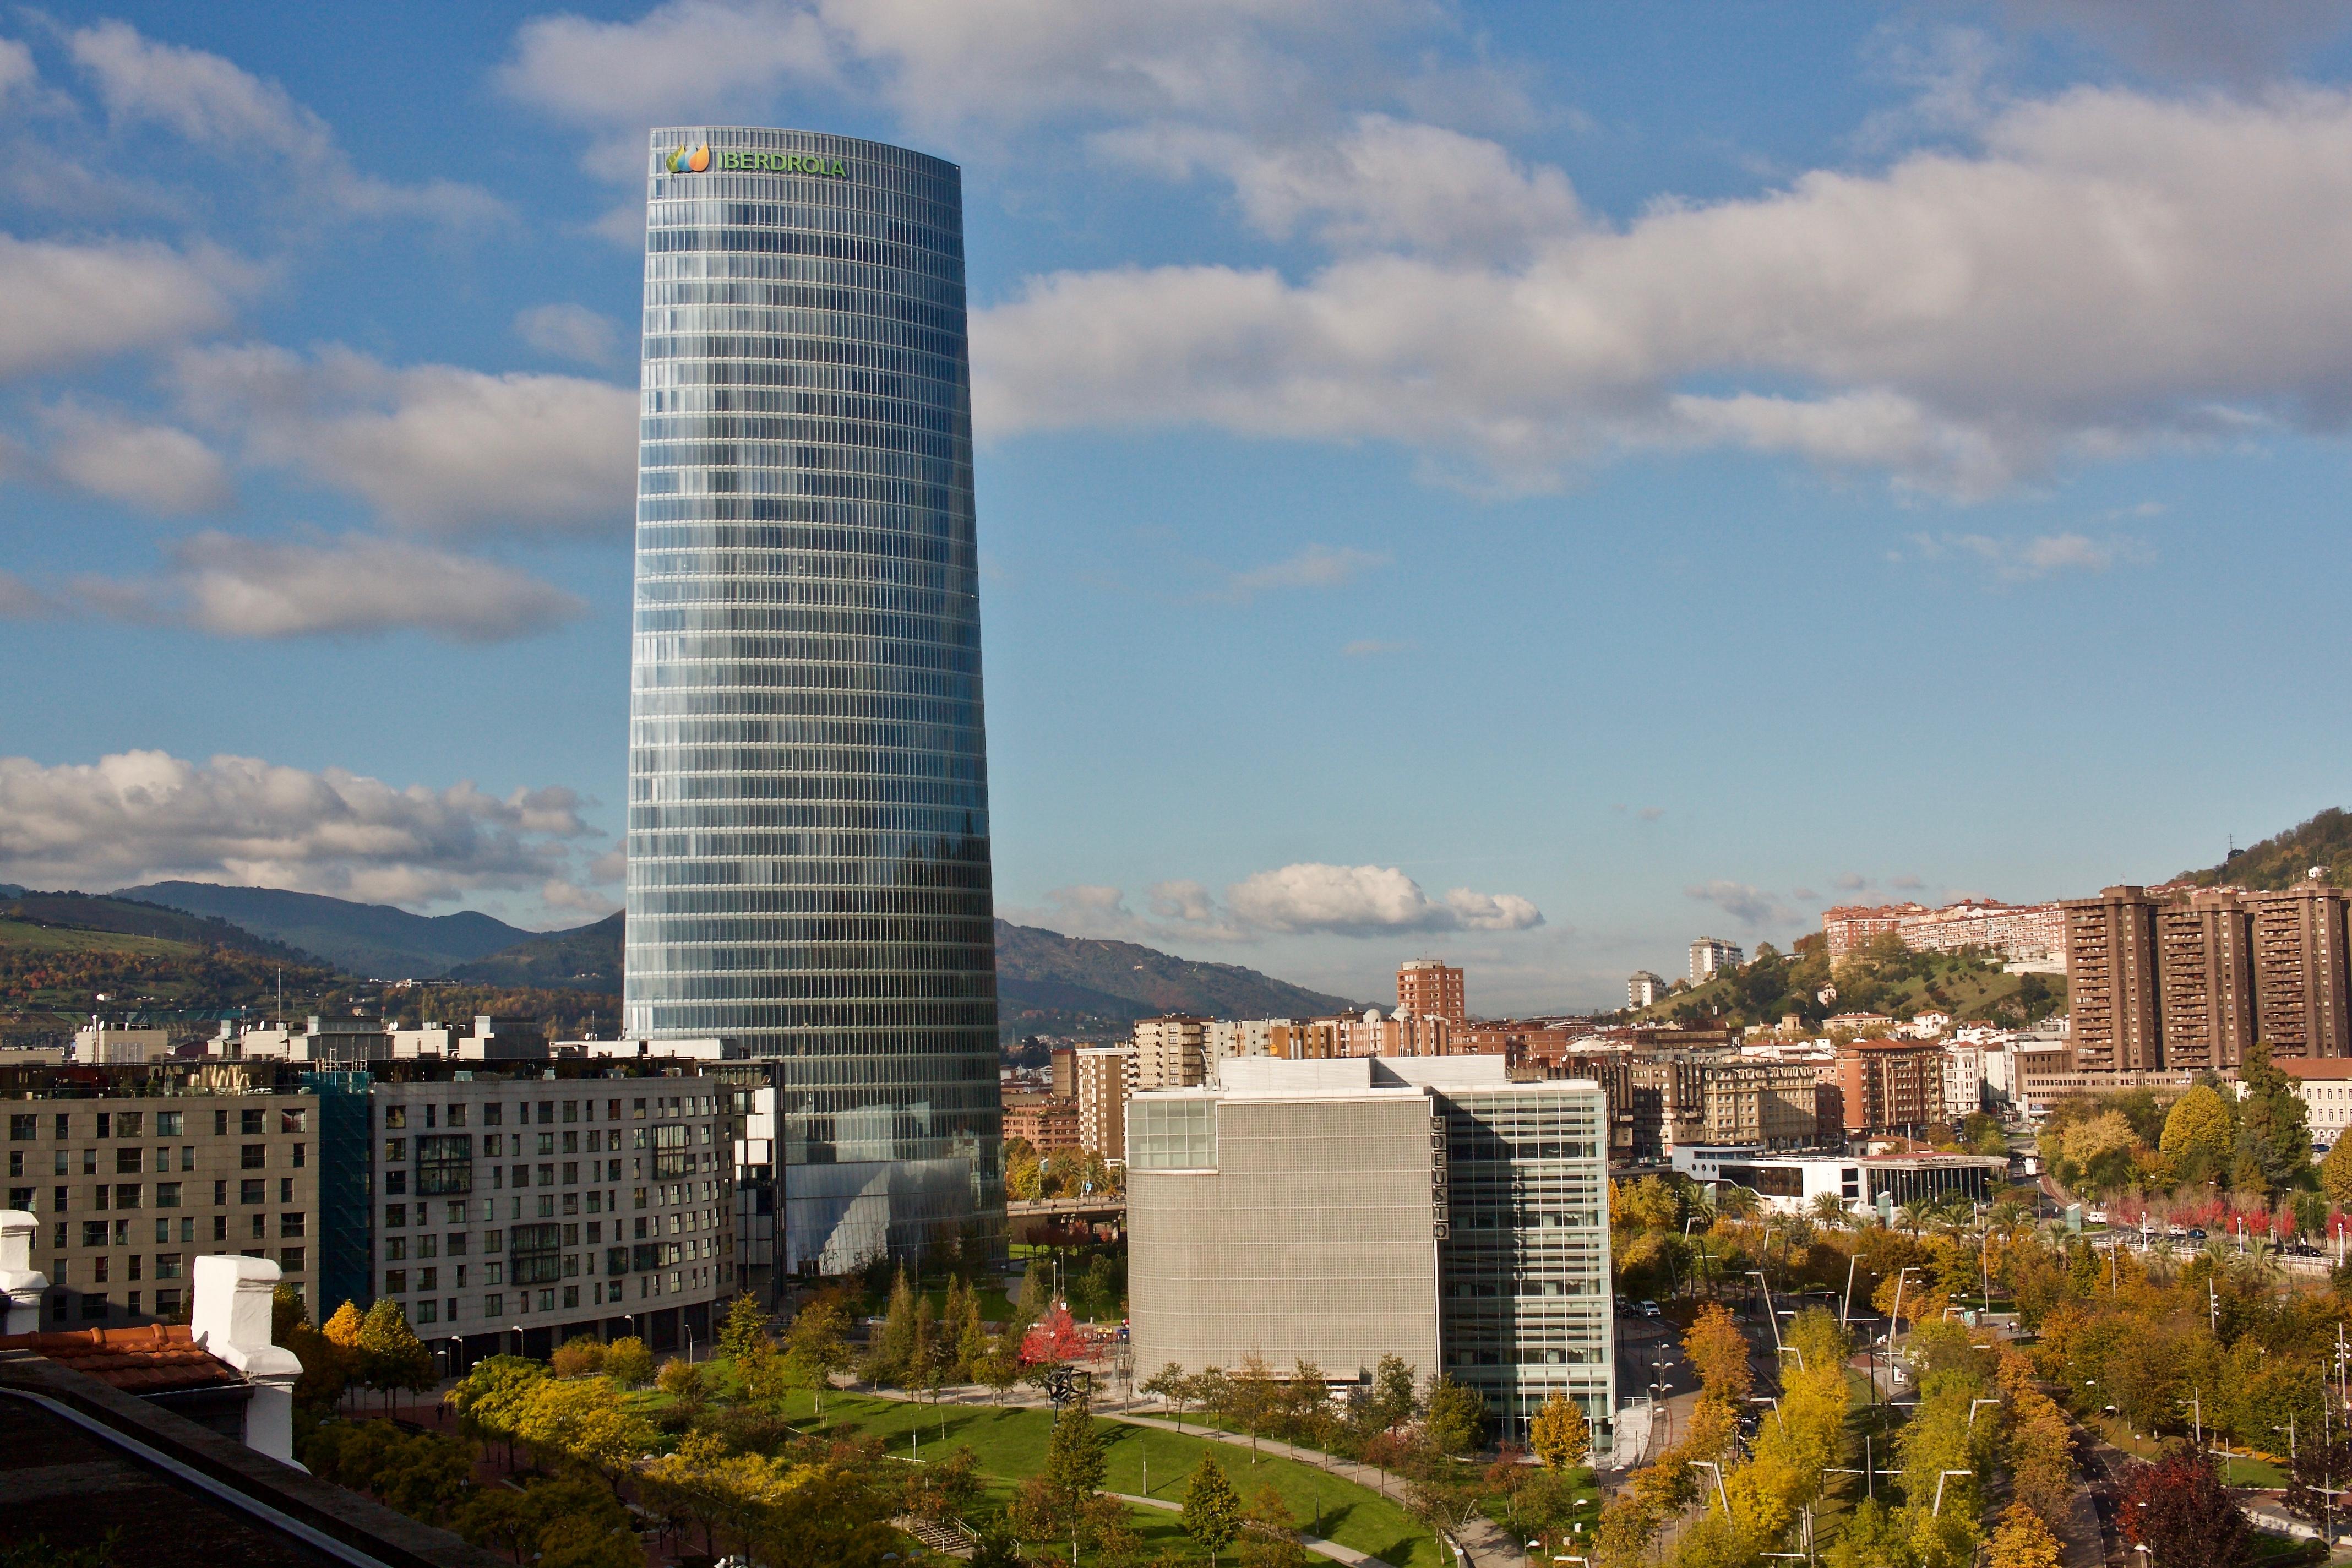 Torre Iberdrola - Bilbao